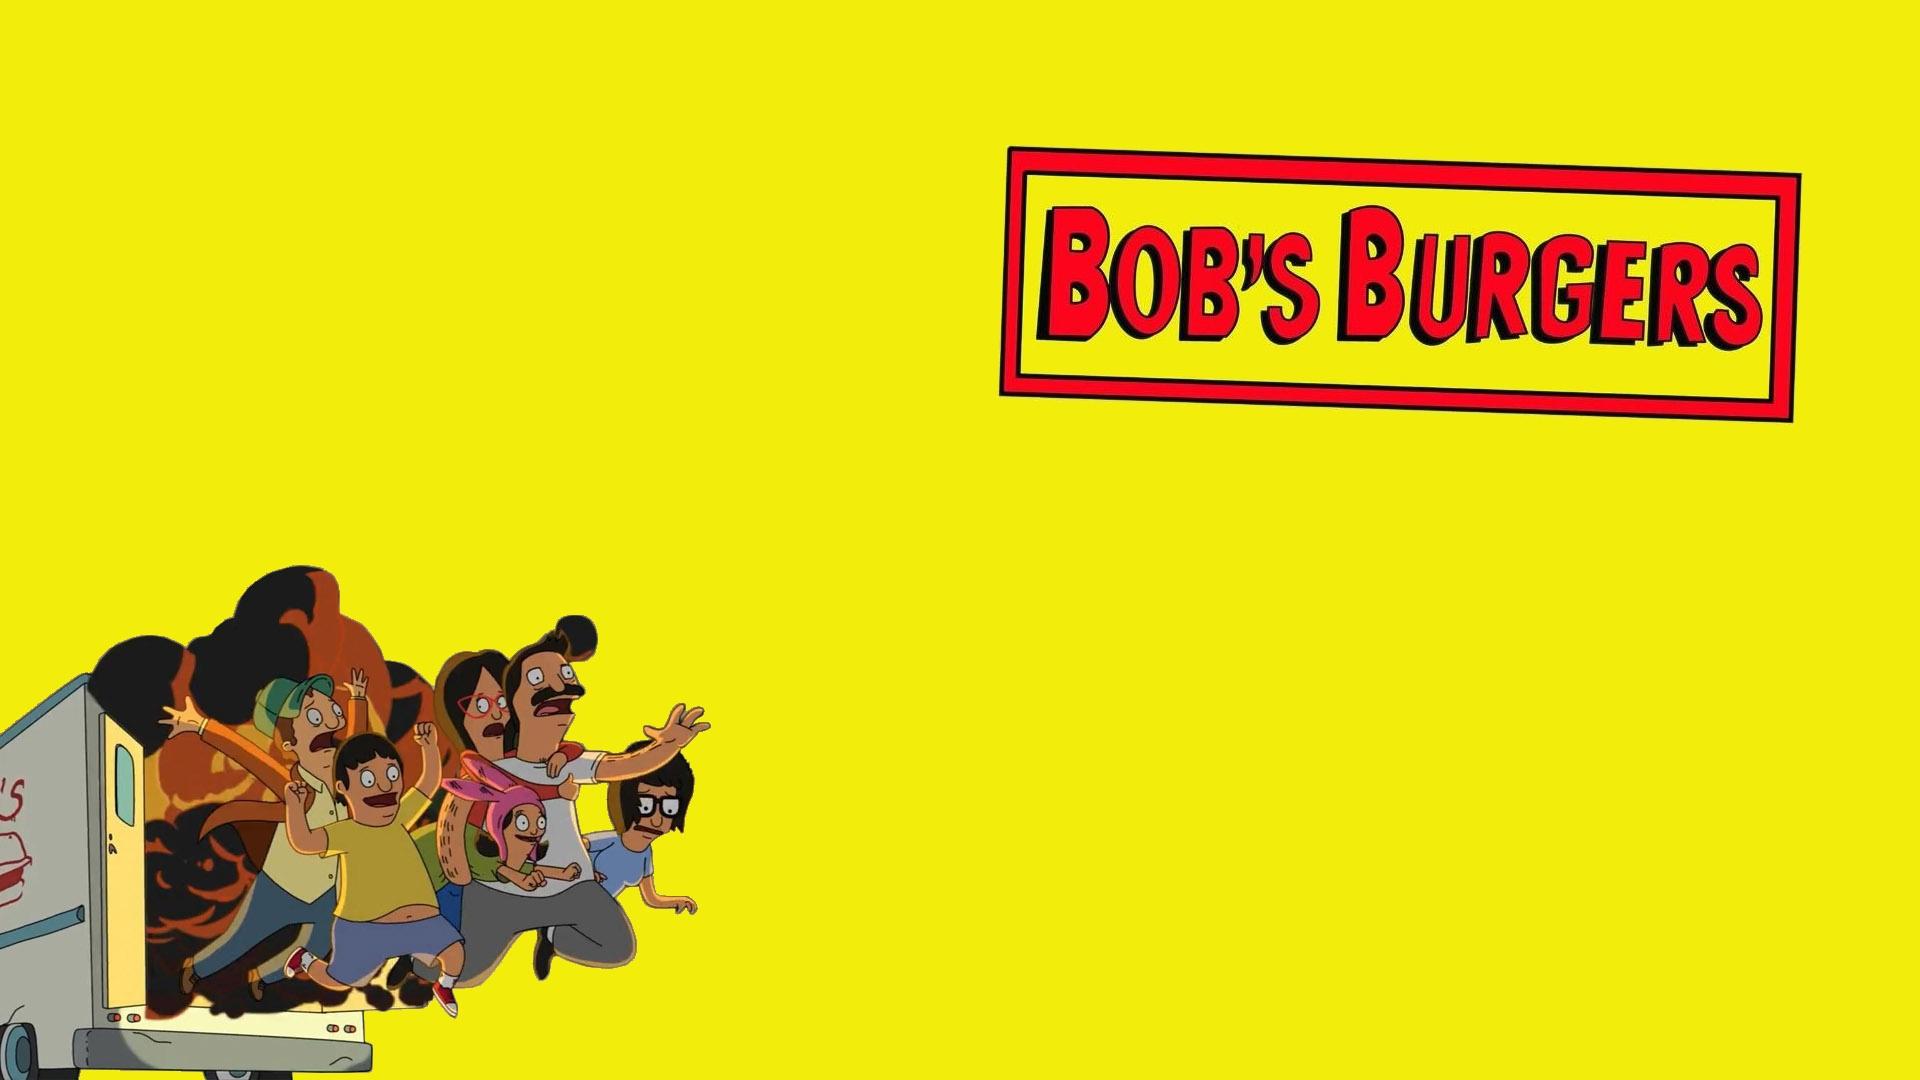 tumblr bob s burgers wallpaper - photo #11